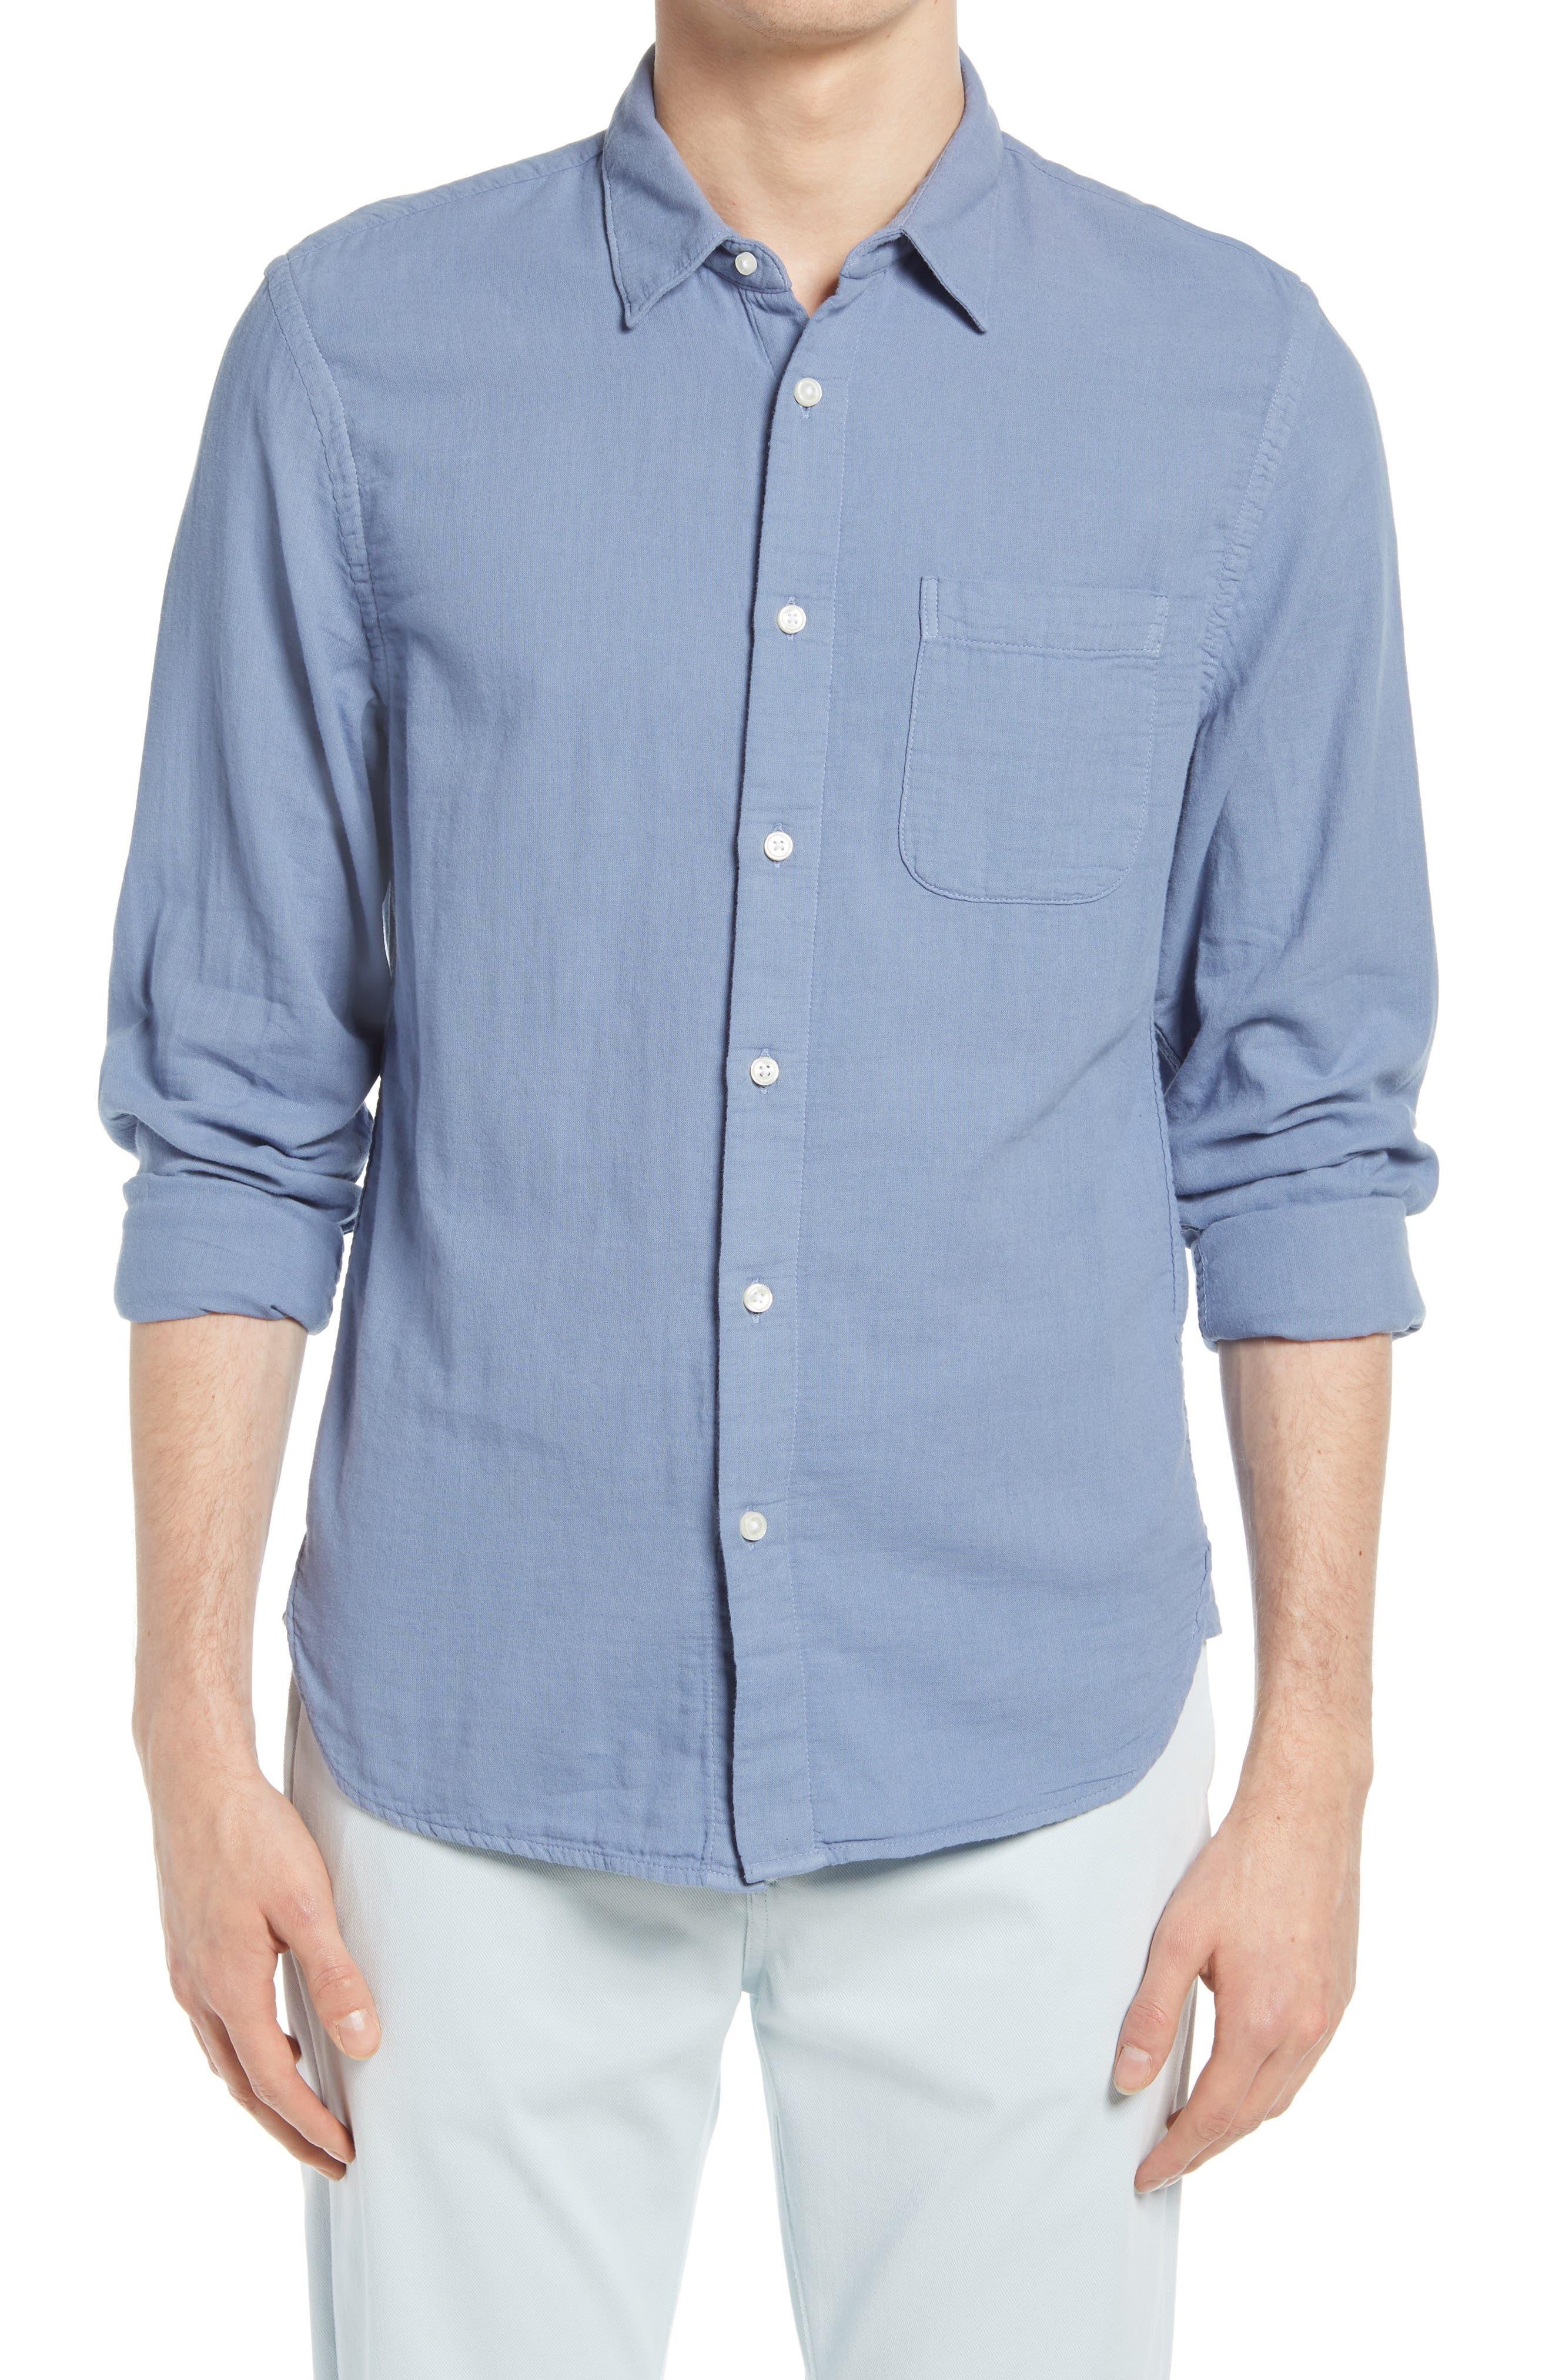 Trim Fit Solid Button-Up Shirt